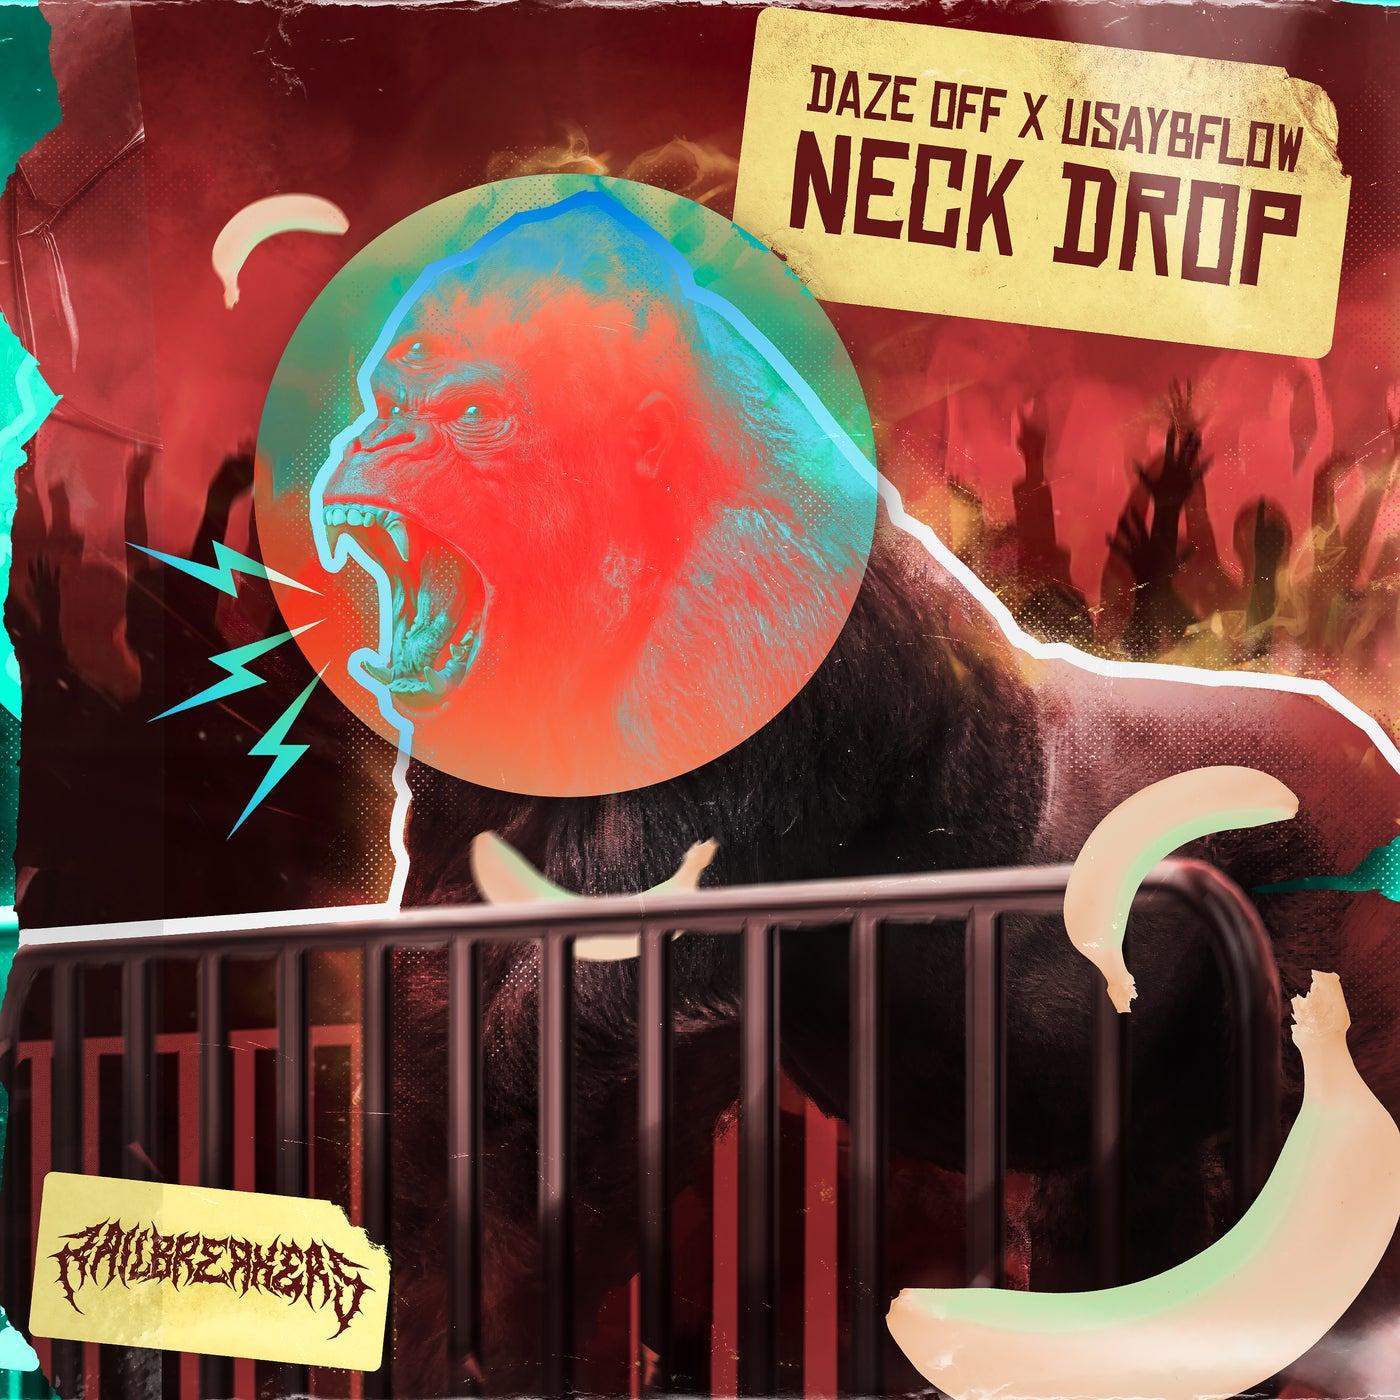 Neck Drop (Original Mix)